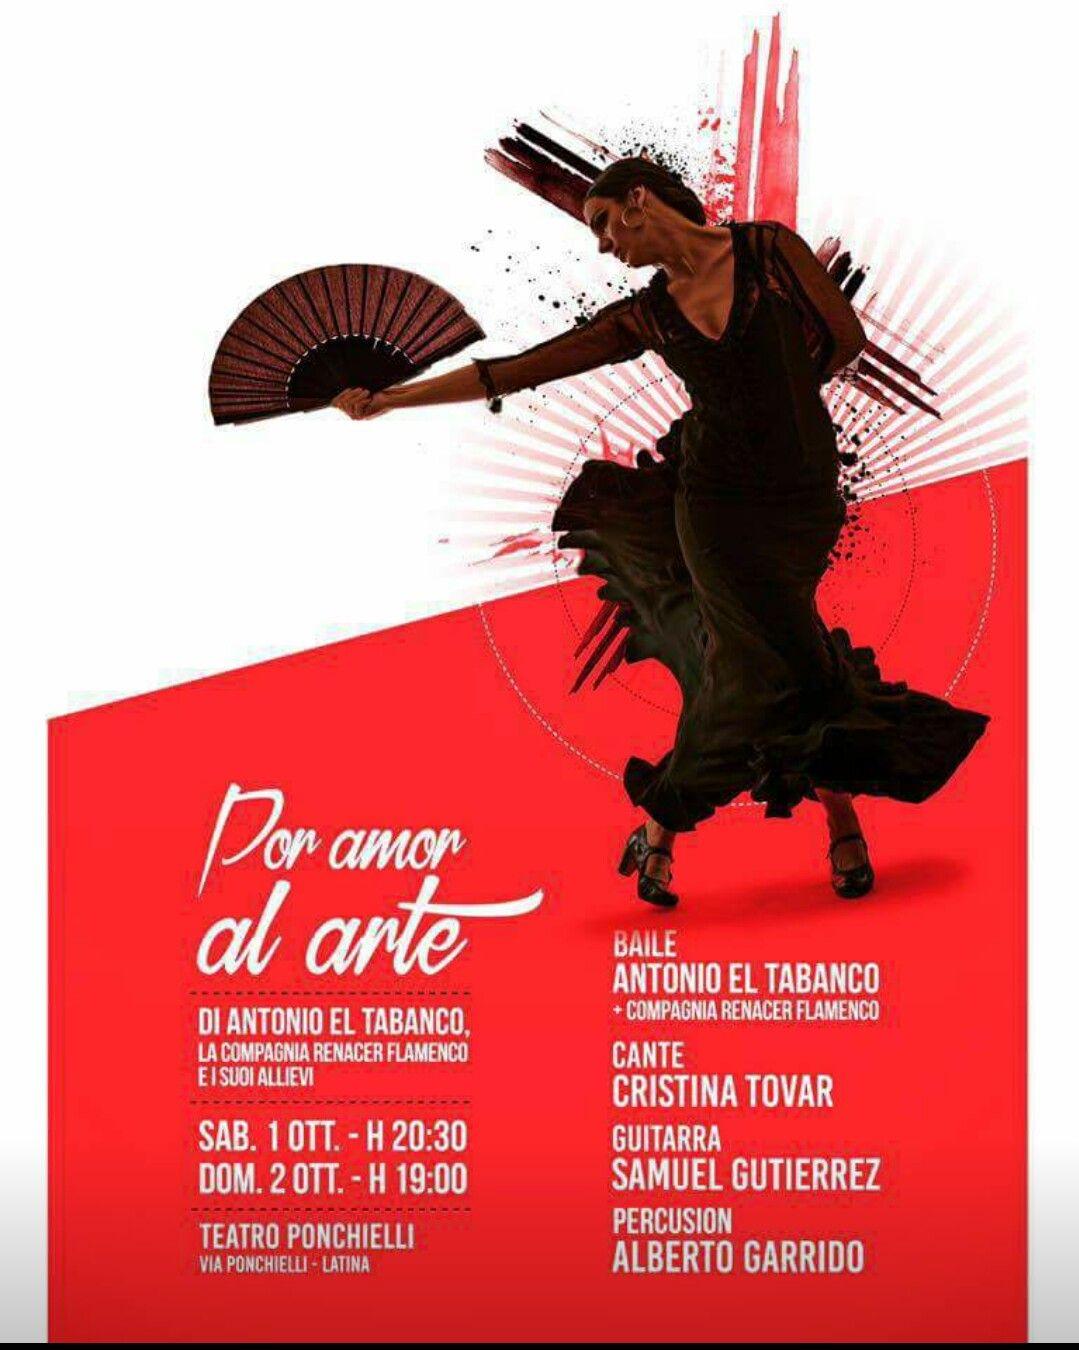 flamenco-dating-gif-twins-deepthroat-porn